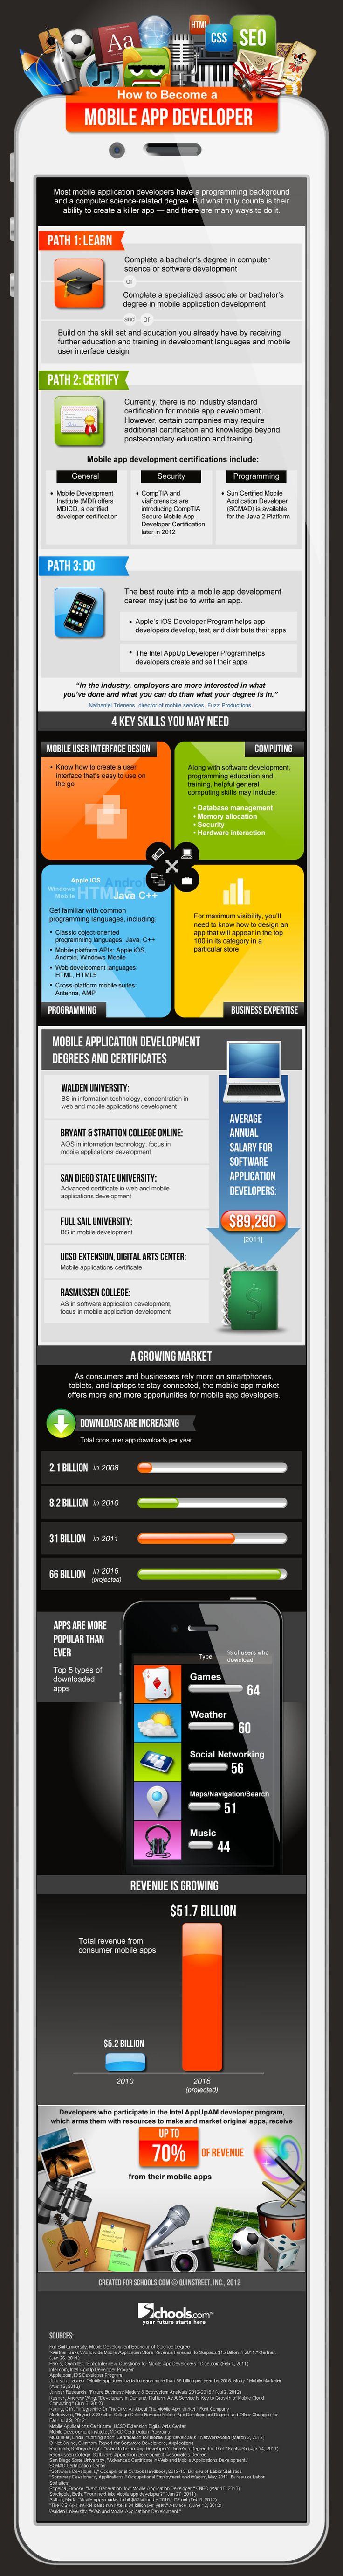 How to Become a Mobile App Developer[Infographic]App Development, Mobile App, Dapplic Mobiles, Development Infographic, Développeur Dapplic, Mobiles Technology, Application Development, Mobiles Infographic, Mobiles Application